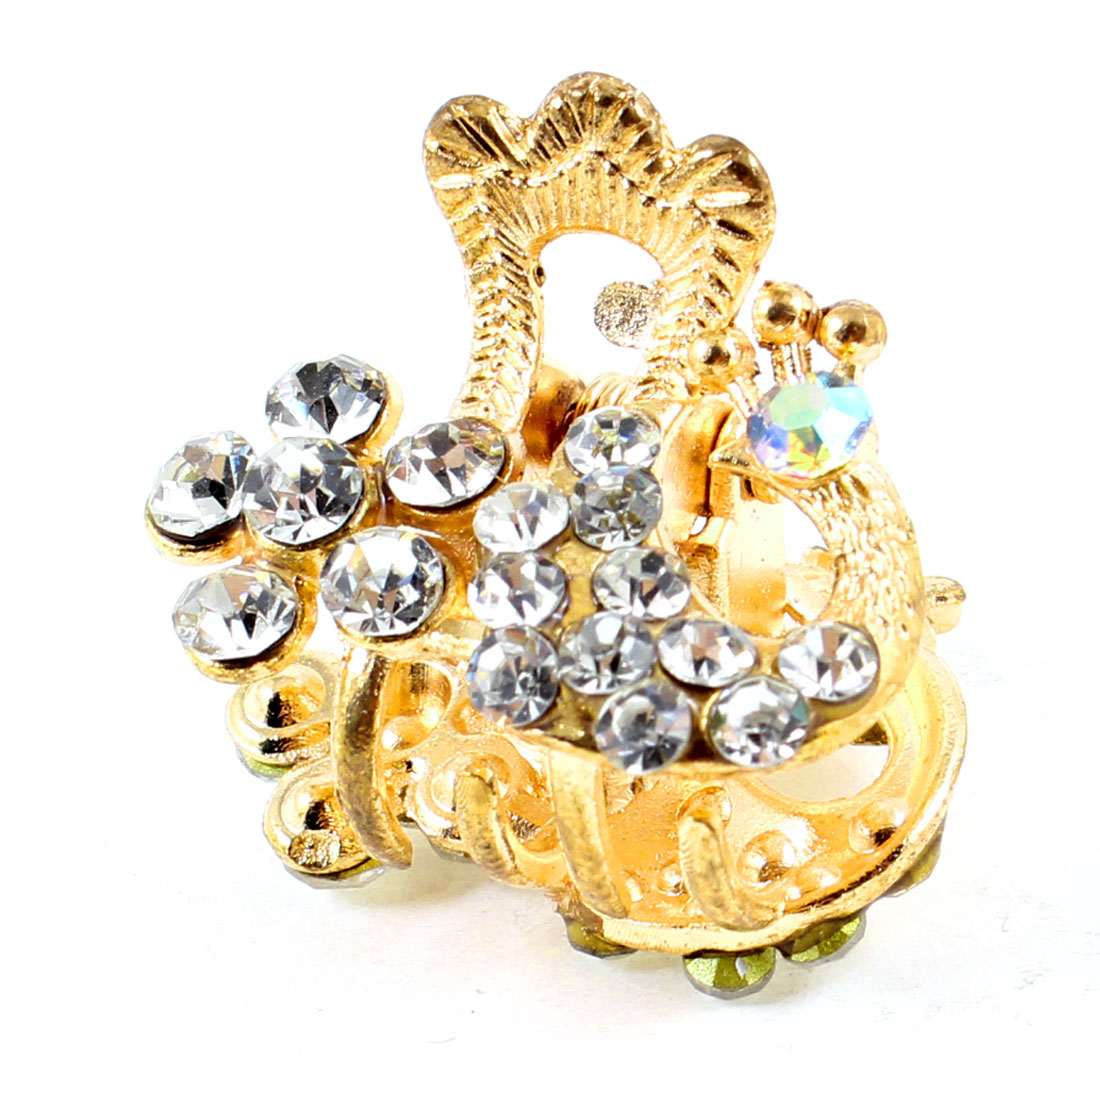 Lady Peacock Design Rhinestones Decor Hair Claw Clip Gold Tone